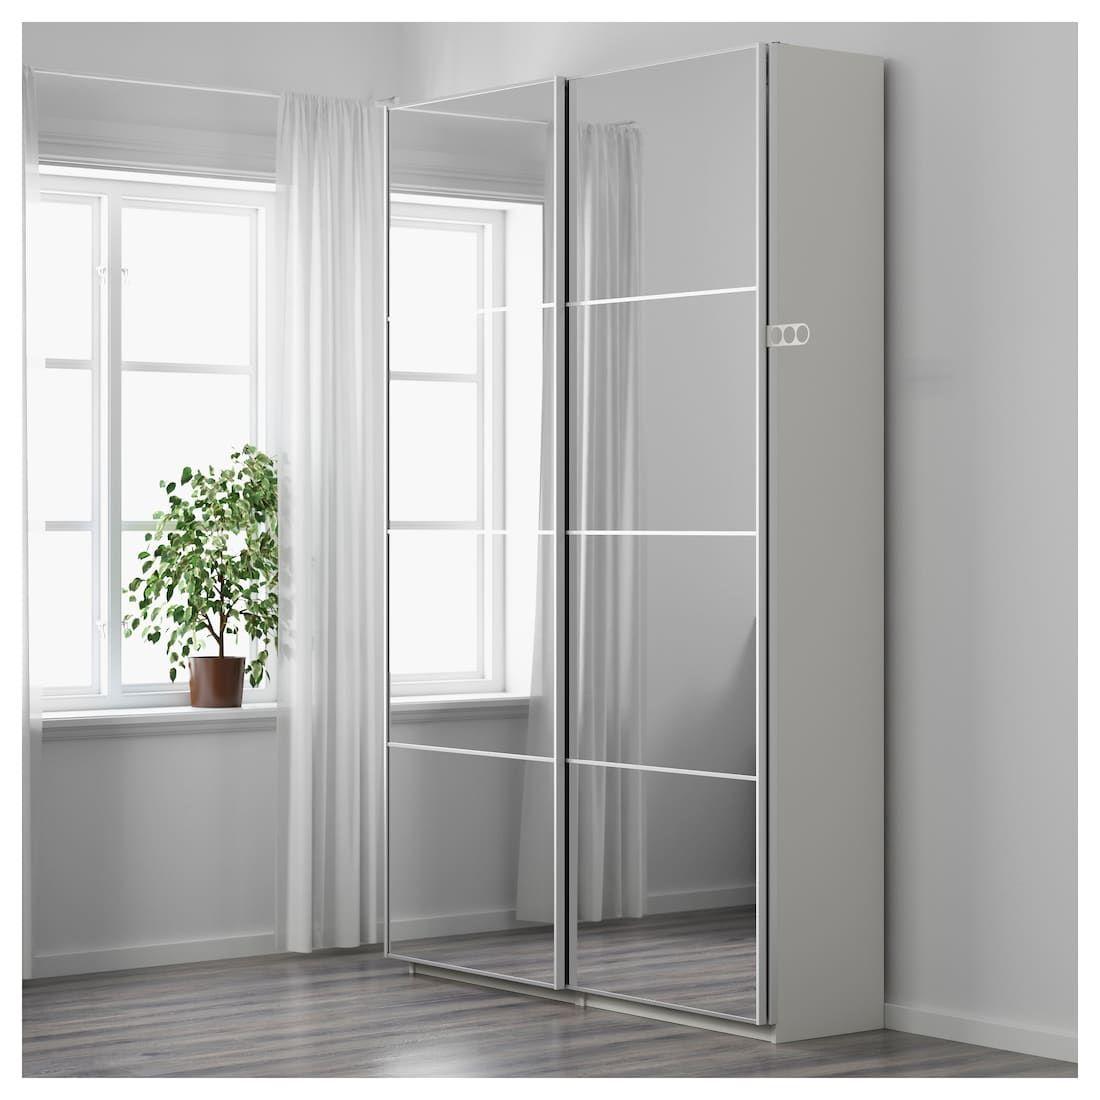 Pax Wardrobe White Auli Mirror Glass 59x17 3 8x93 1 8 Ikea Pax Wardrobe Bedroom Decor Ikea Wardrobe